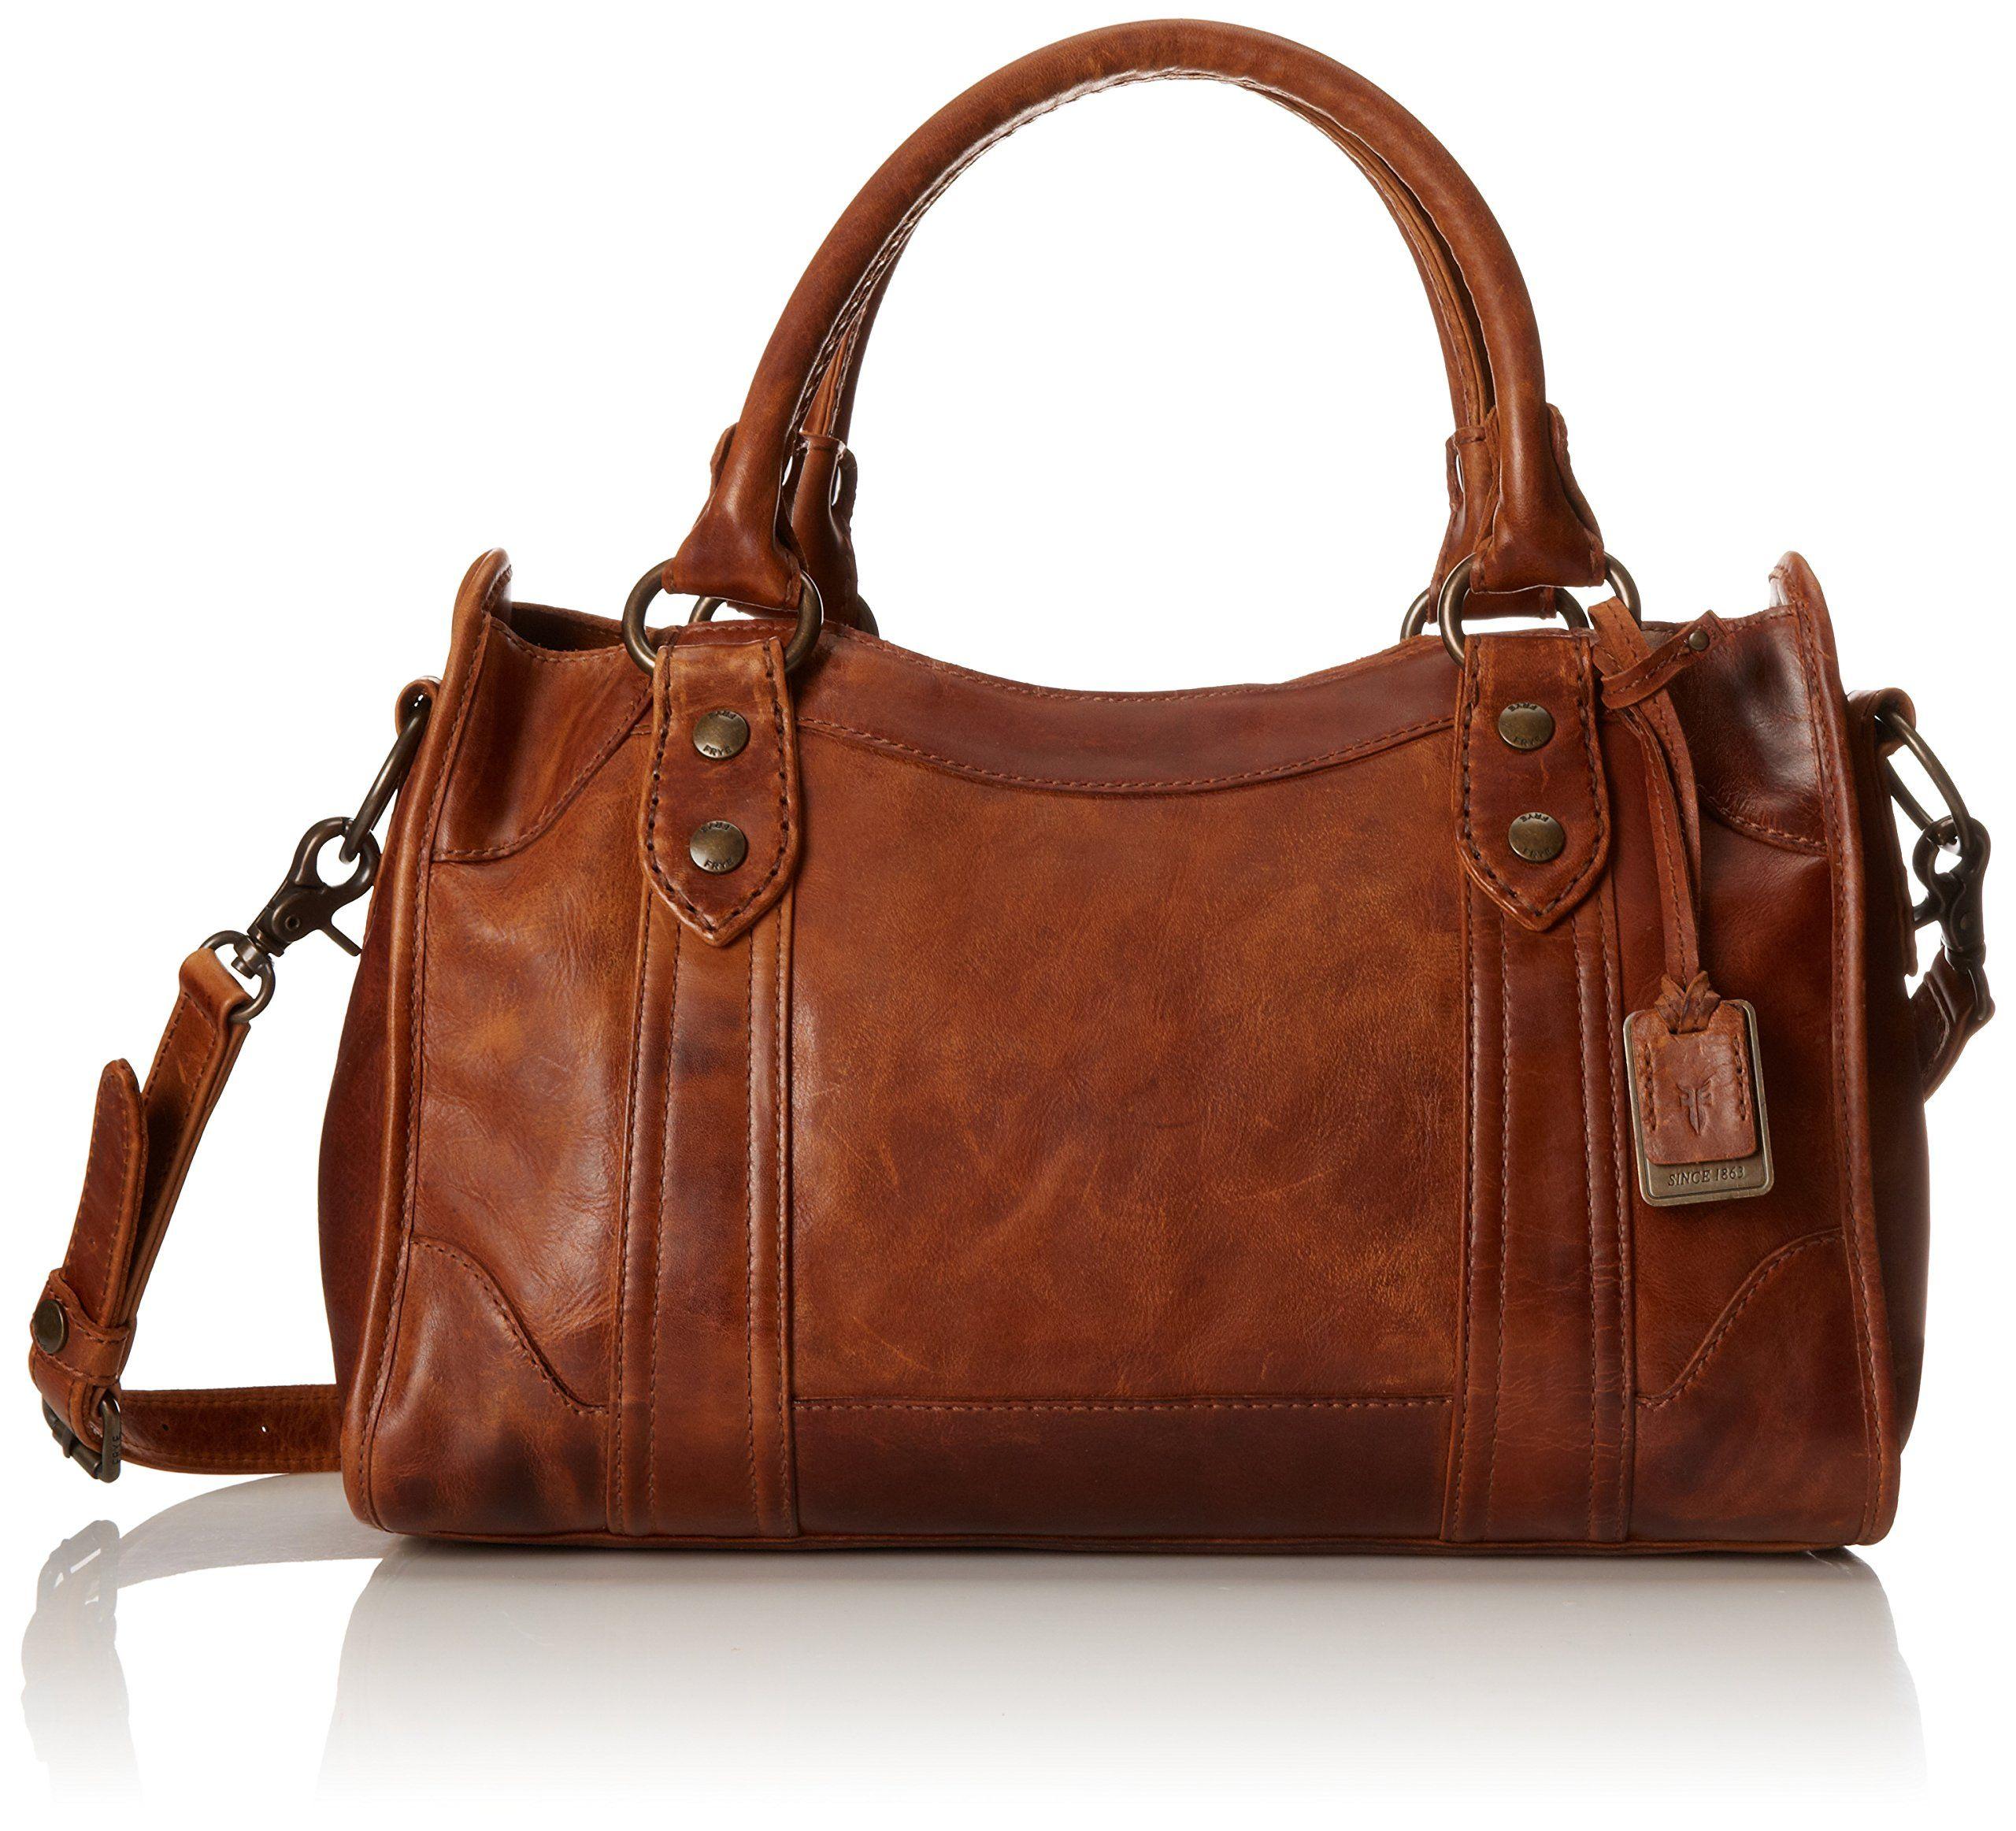 FRYE Melissa Satchel Handbag, Cognac, One Size: Handbags: Amazon ...